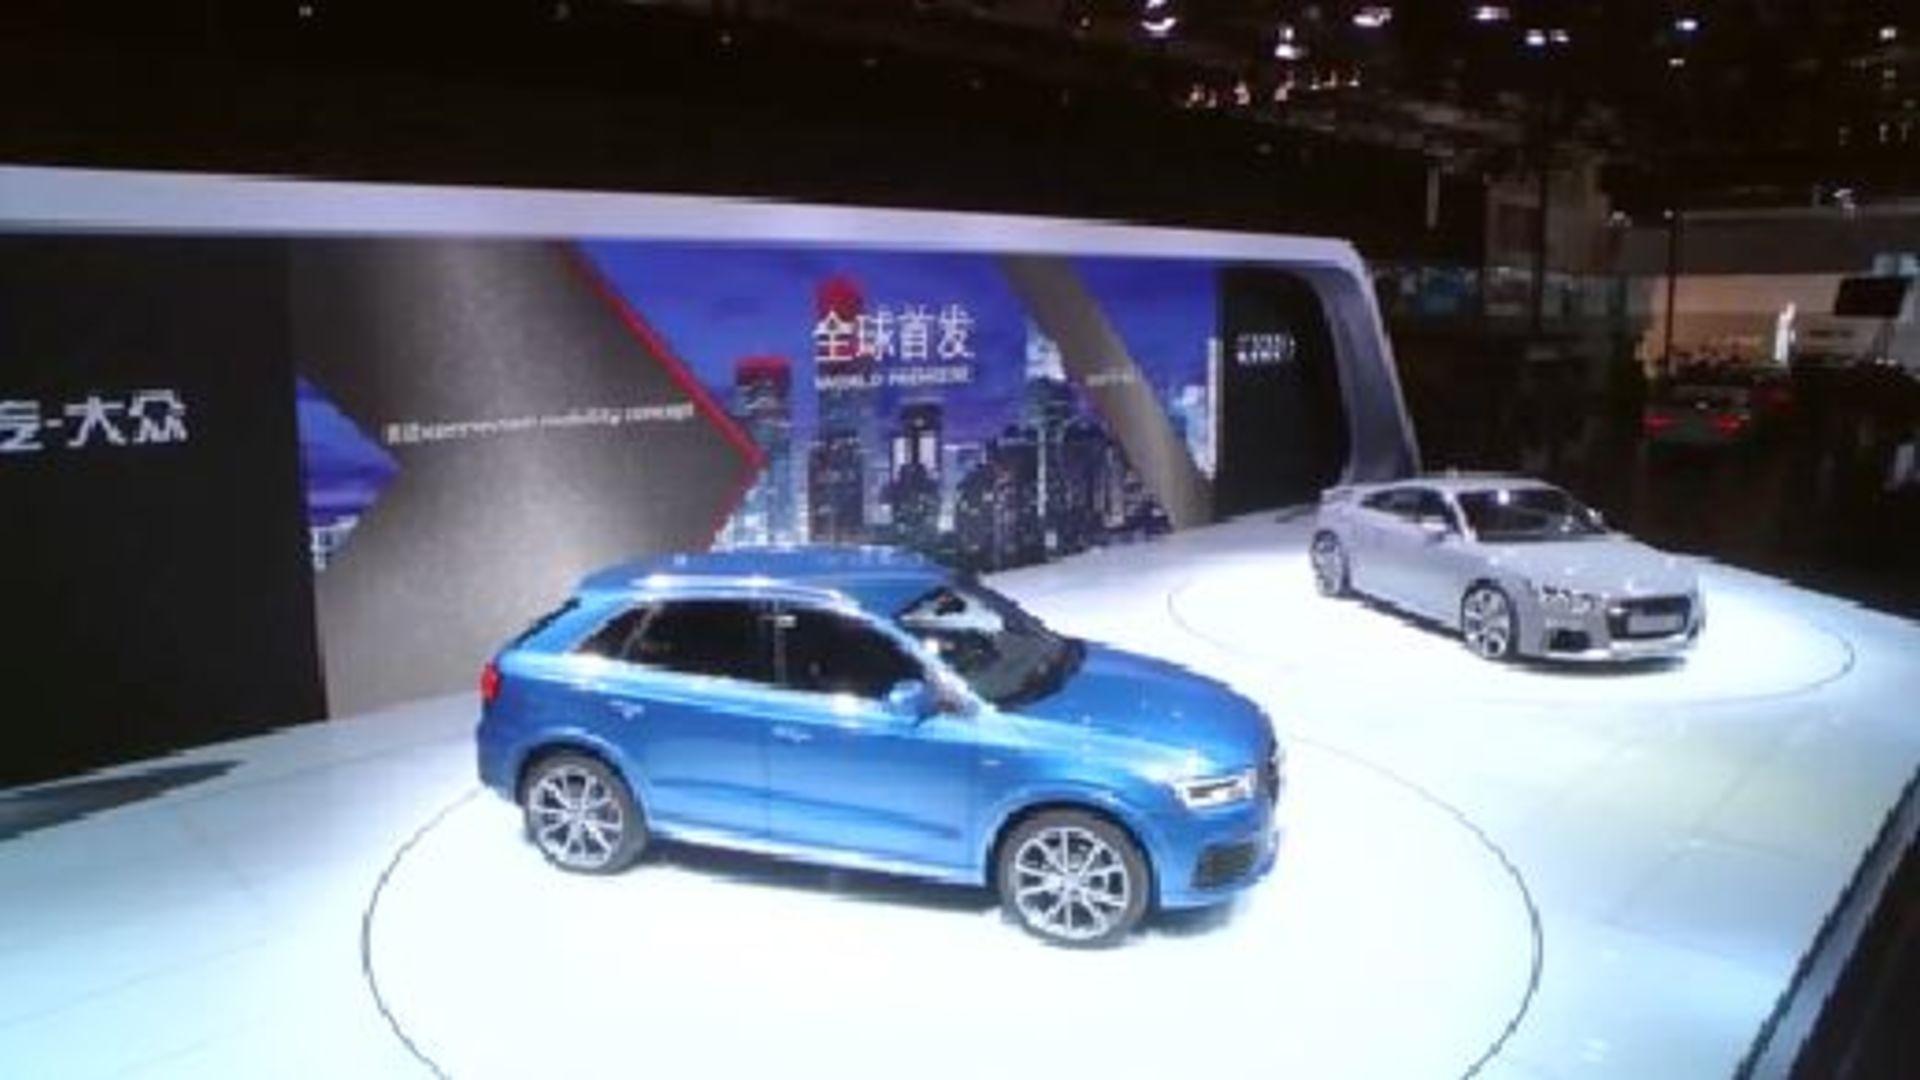 Auto China 2016 in Peking - Die Audi Pressekonferenz